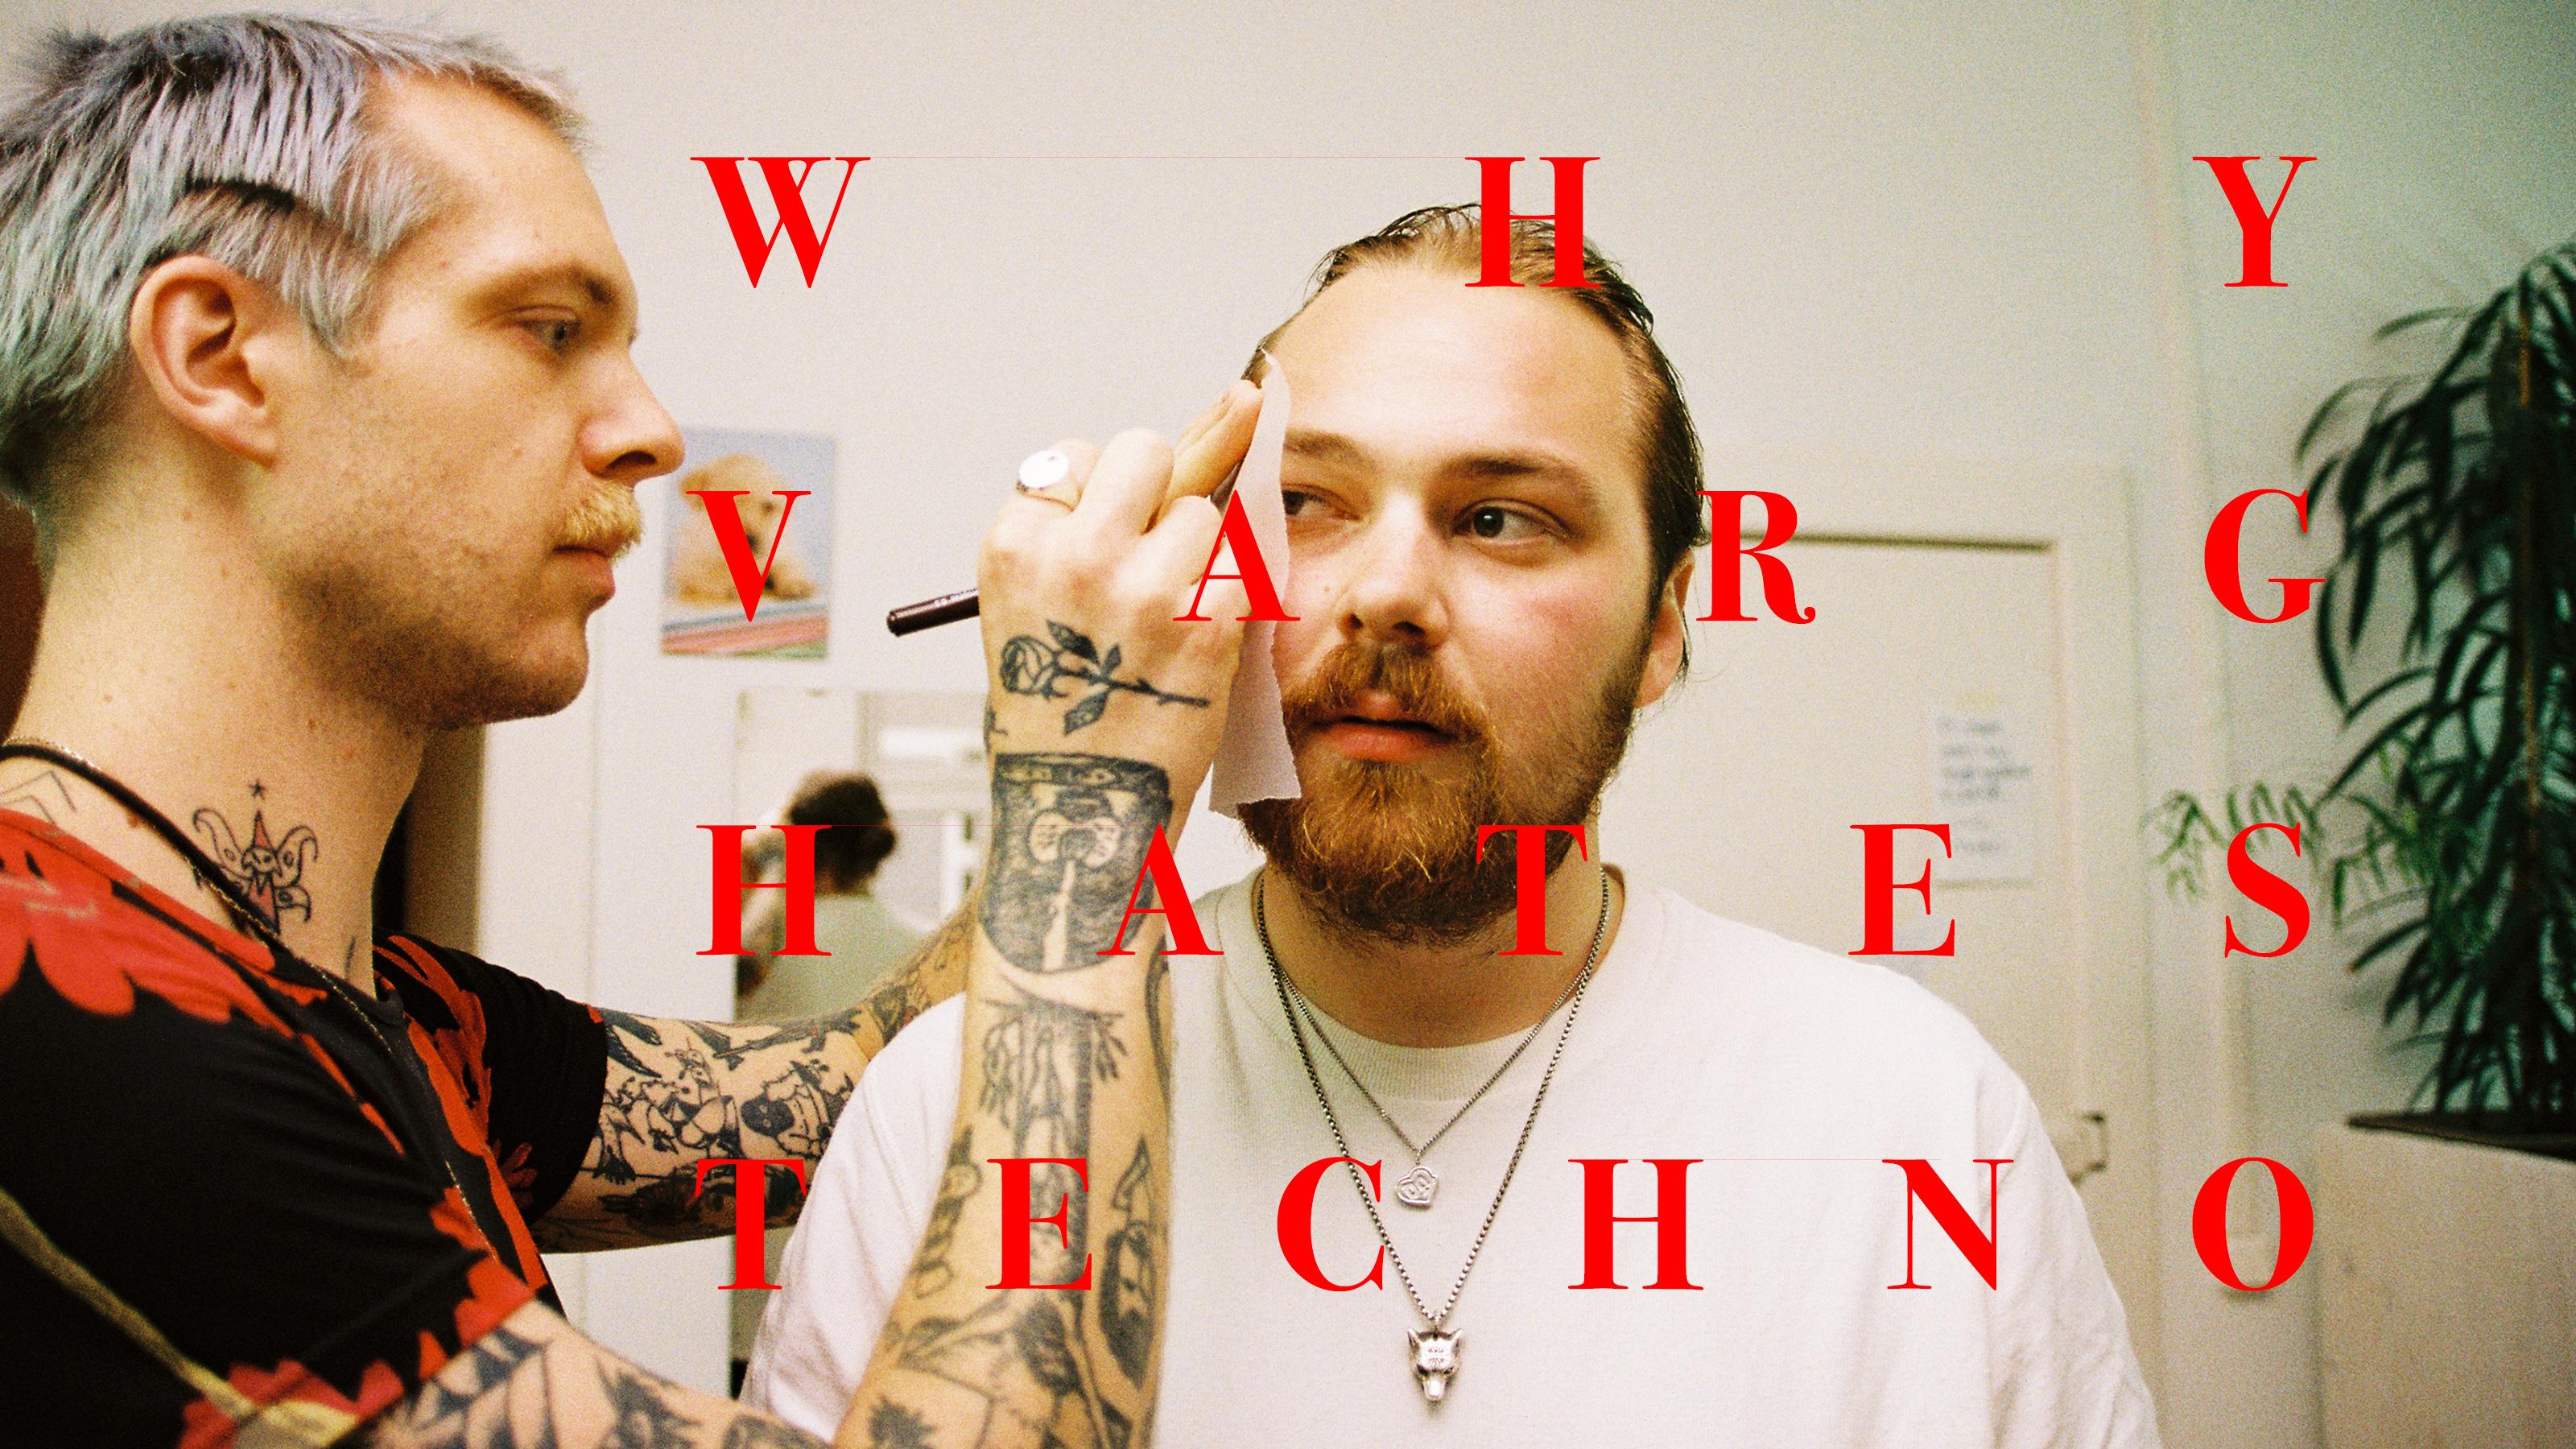 Why Varg hates techno